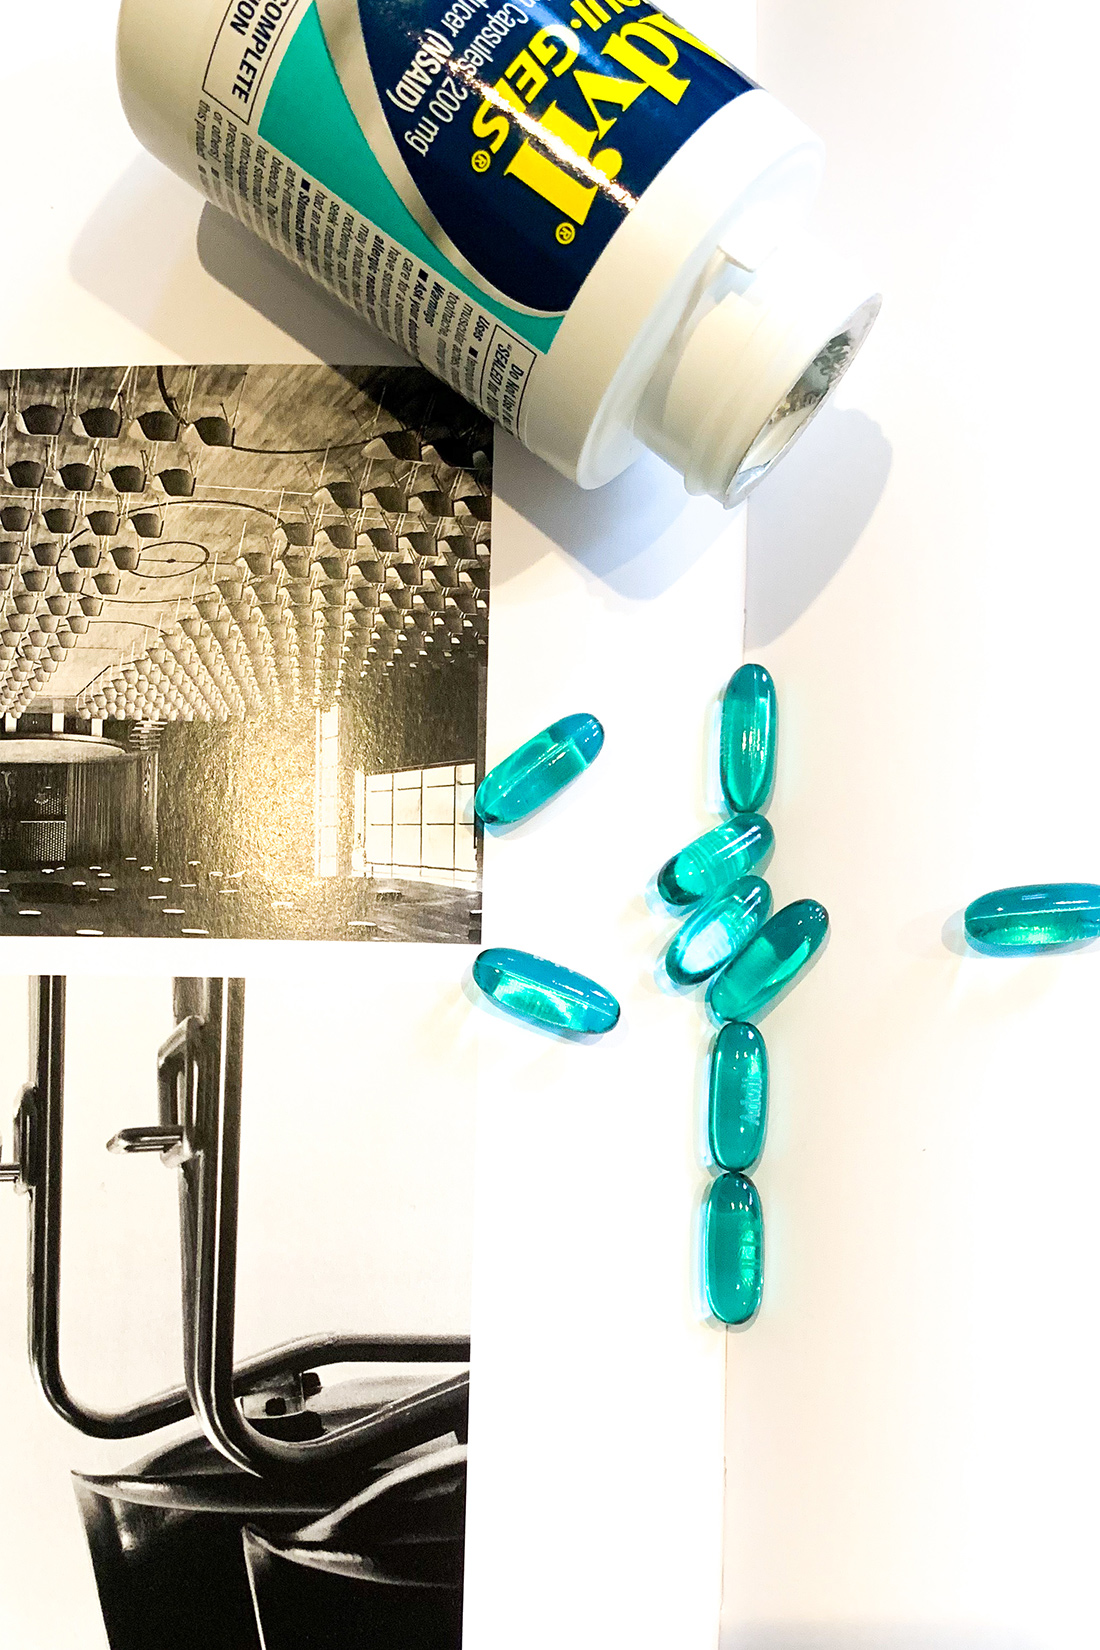 Advil featured